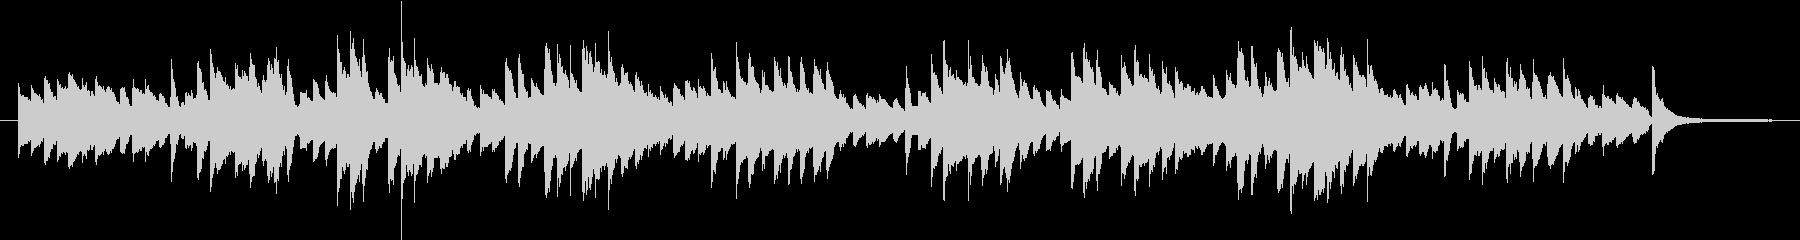 English folk song simple piano accompaniment's unreproduced waveform